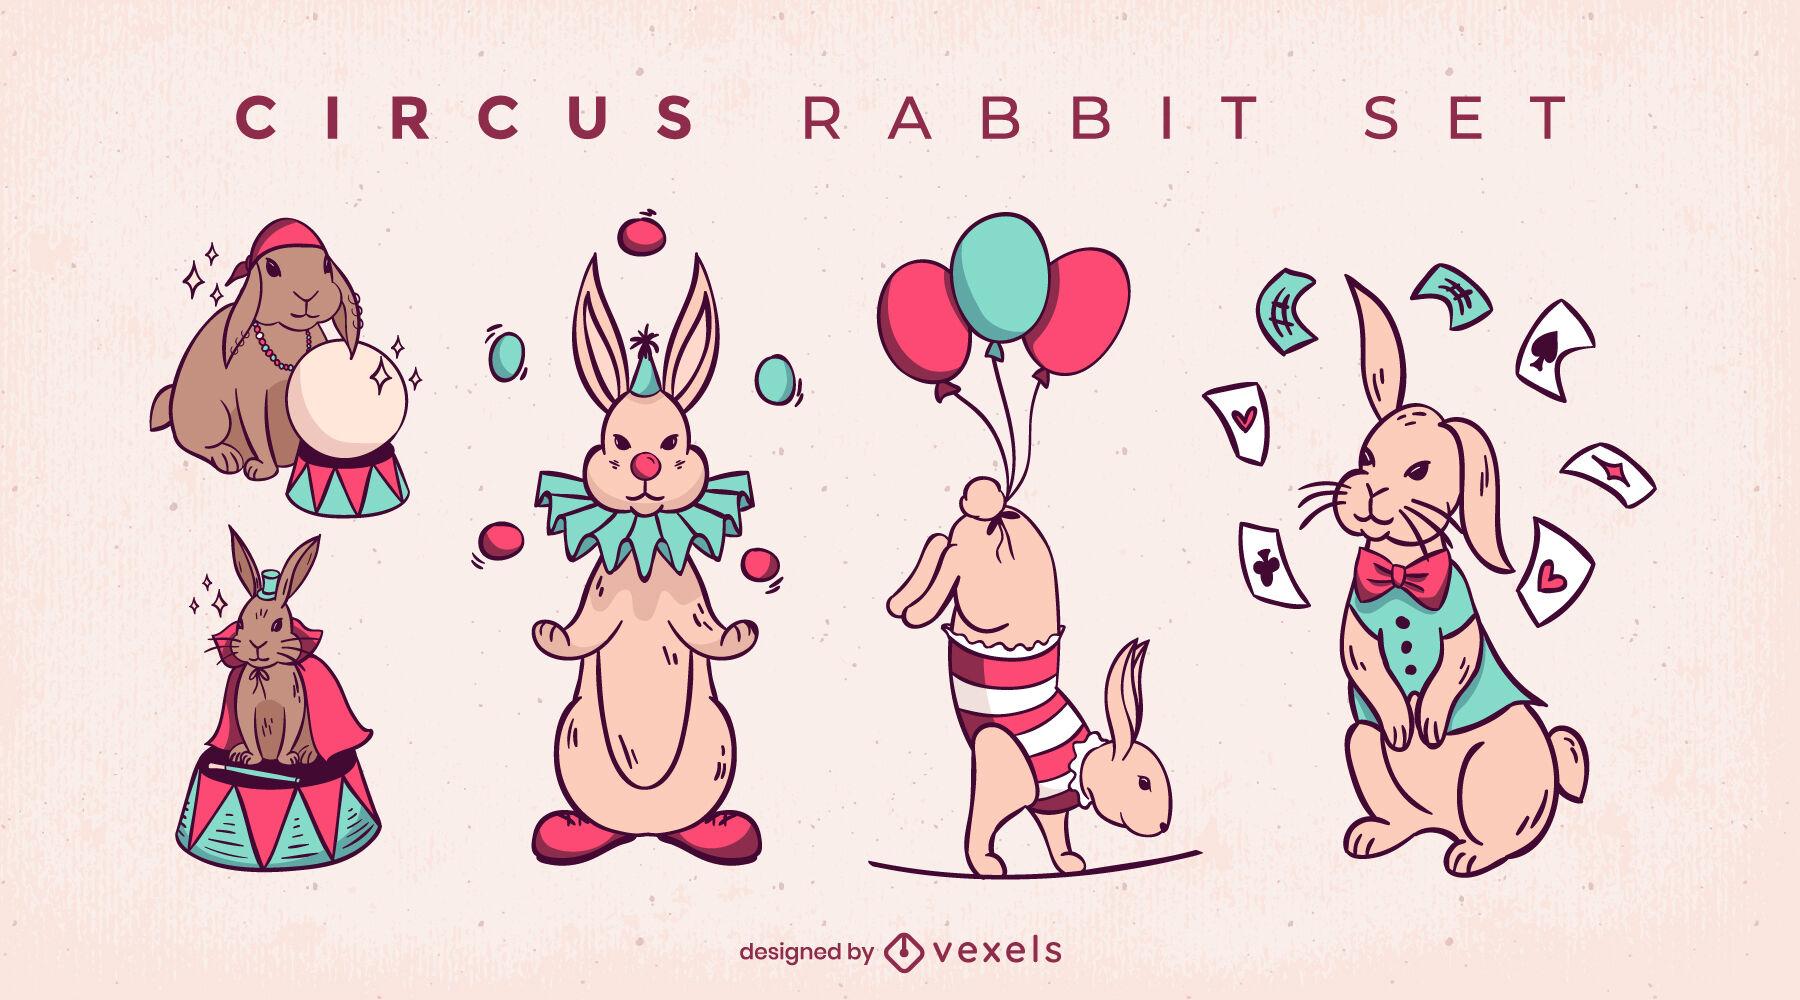 Circus rabbit animal magic tricks set